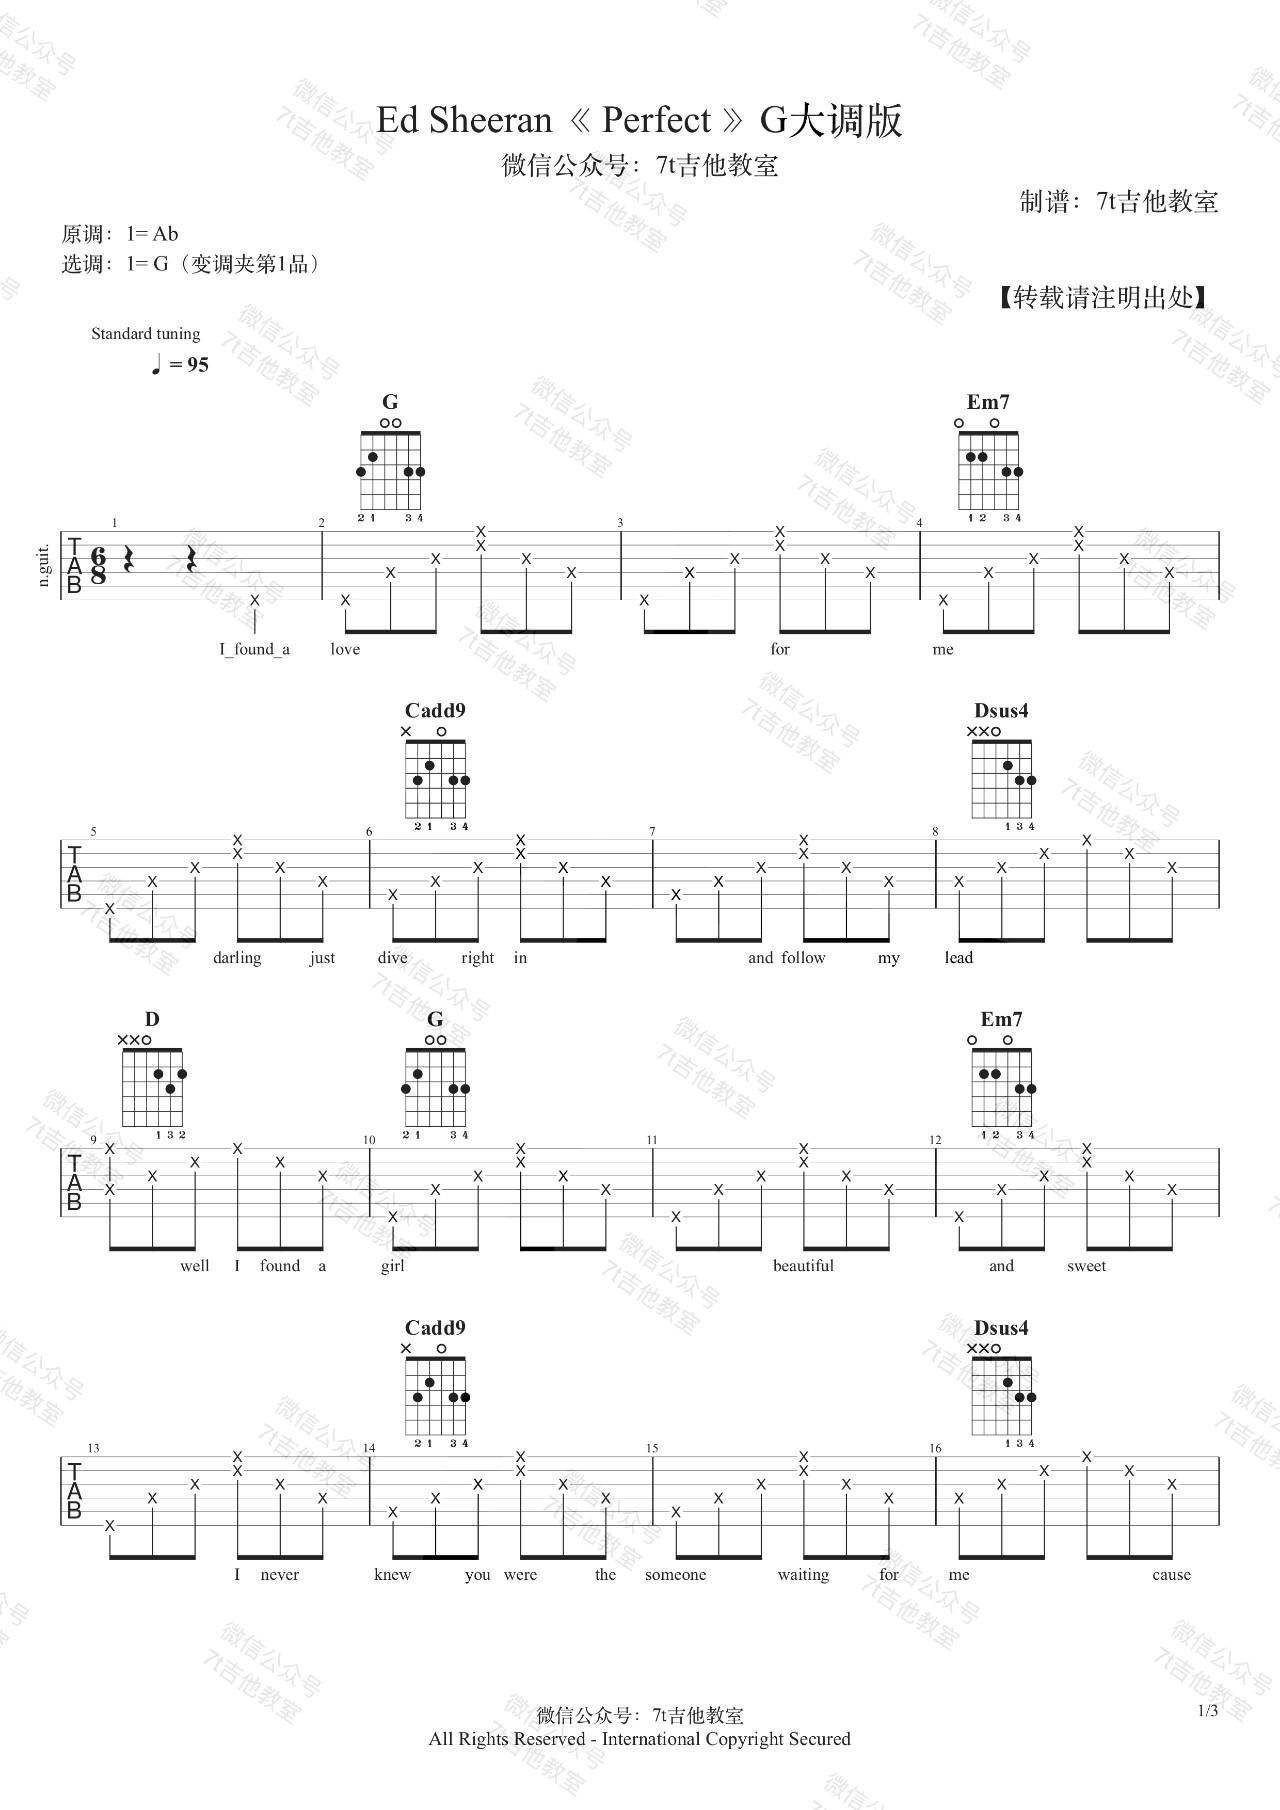 Perfect吉他谱G调版-1